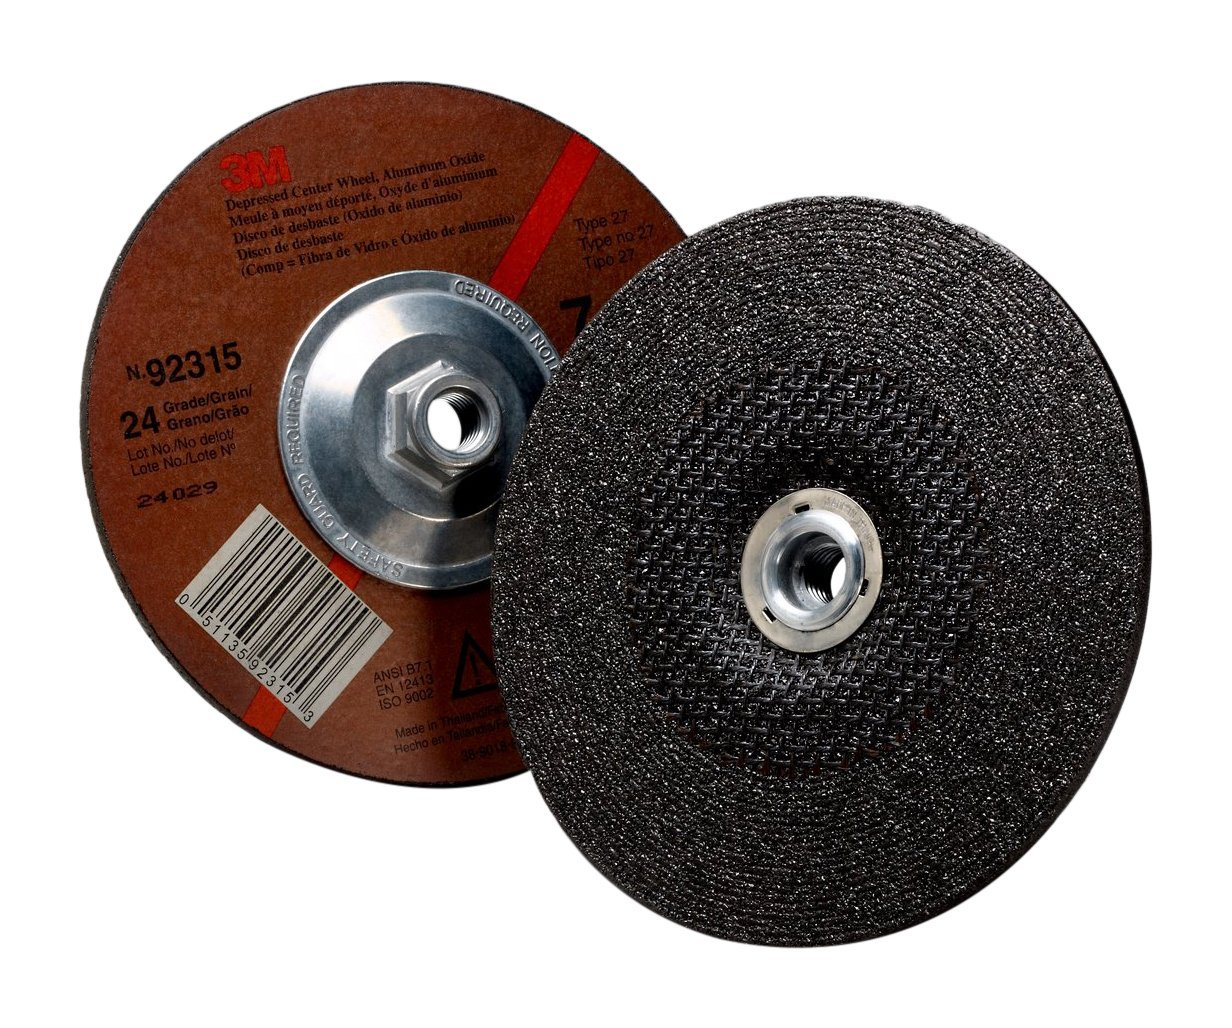 "3M 92315 General Purpose Depressed Center Wheel, 7"" x 1/4"" x 5/8-11"", Internal 24, 7"" Diameter, Adhesive Backed, Abrasive Grit, Aluminum Oxide, 7.15"" Width, 8500 rpm"